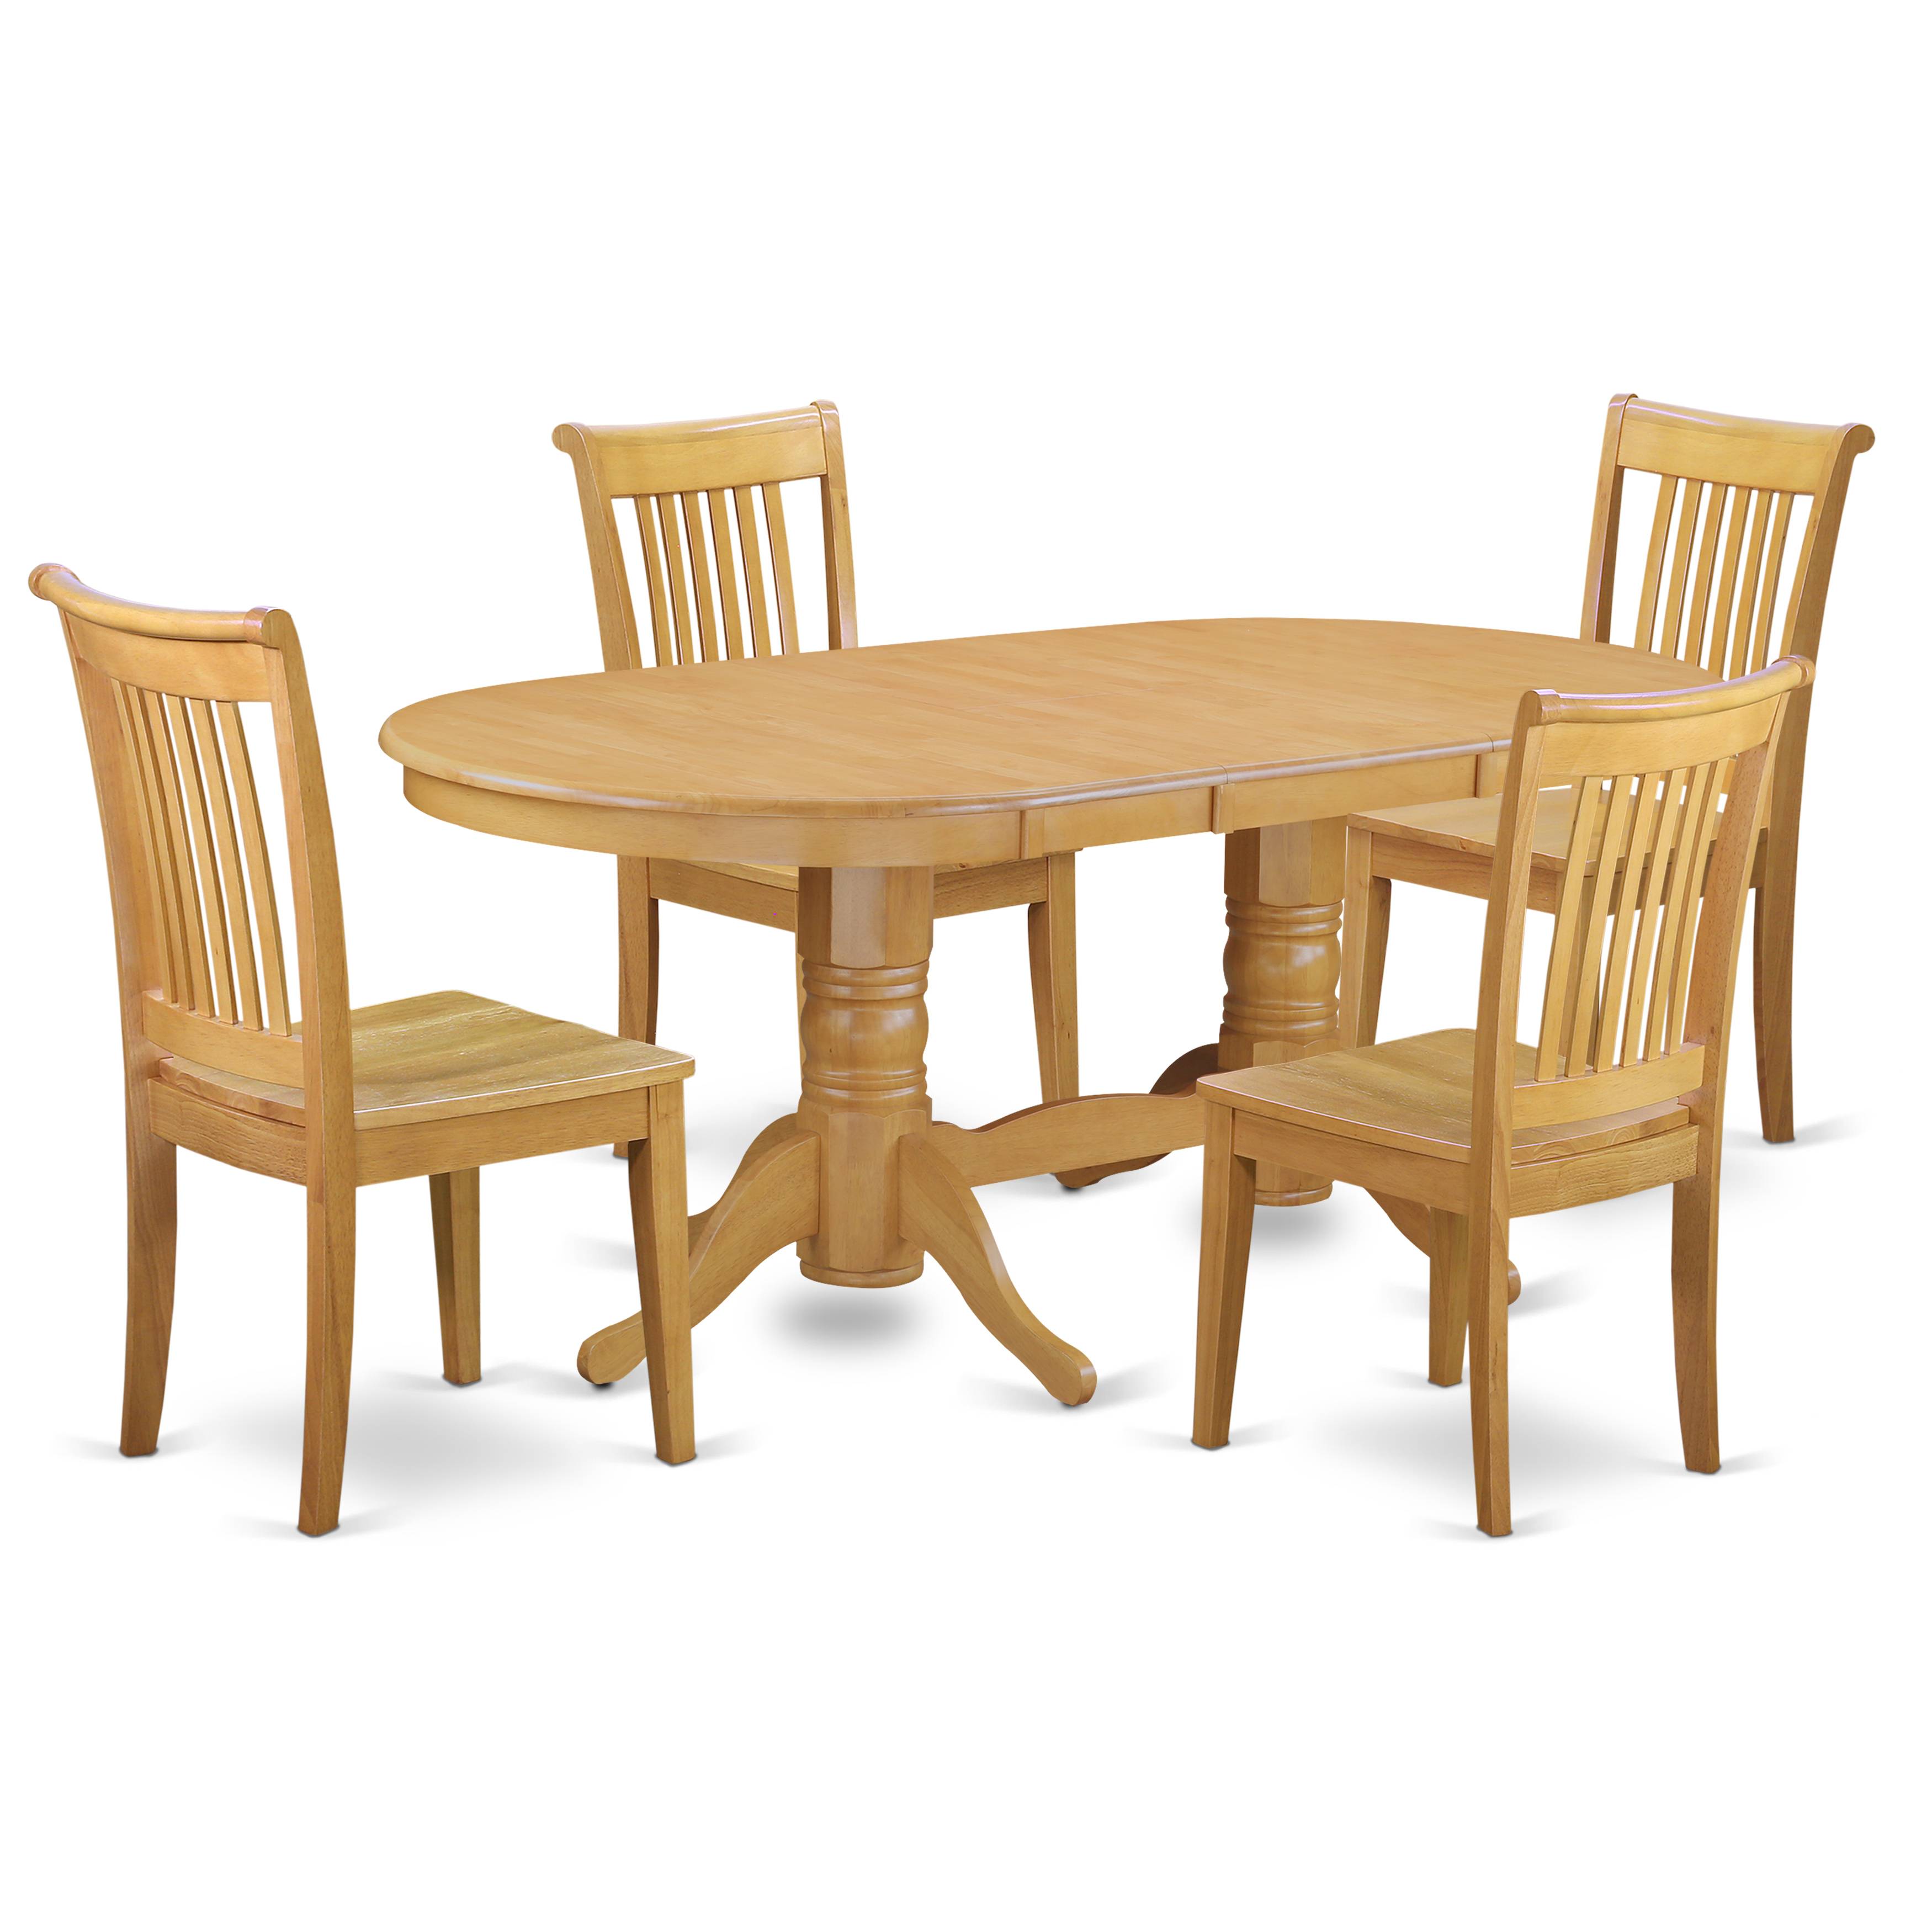 Dollhouse Miniature Oval Oak Dining Room Table